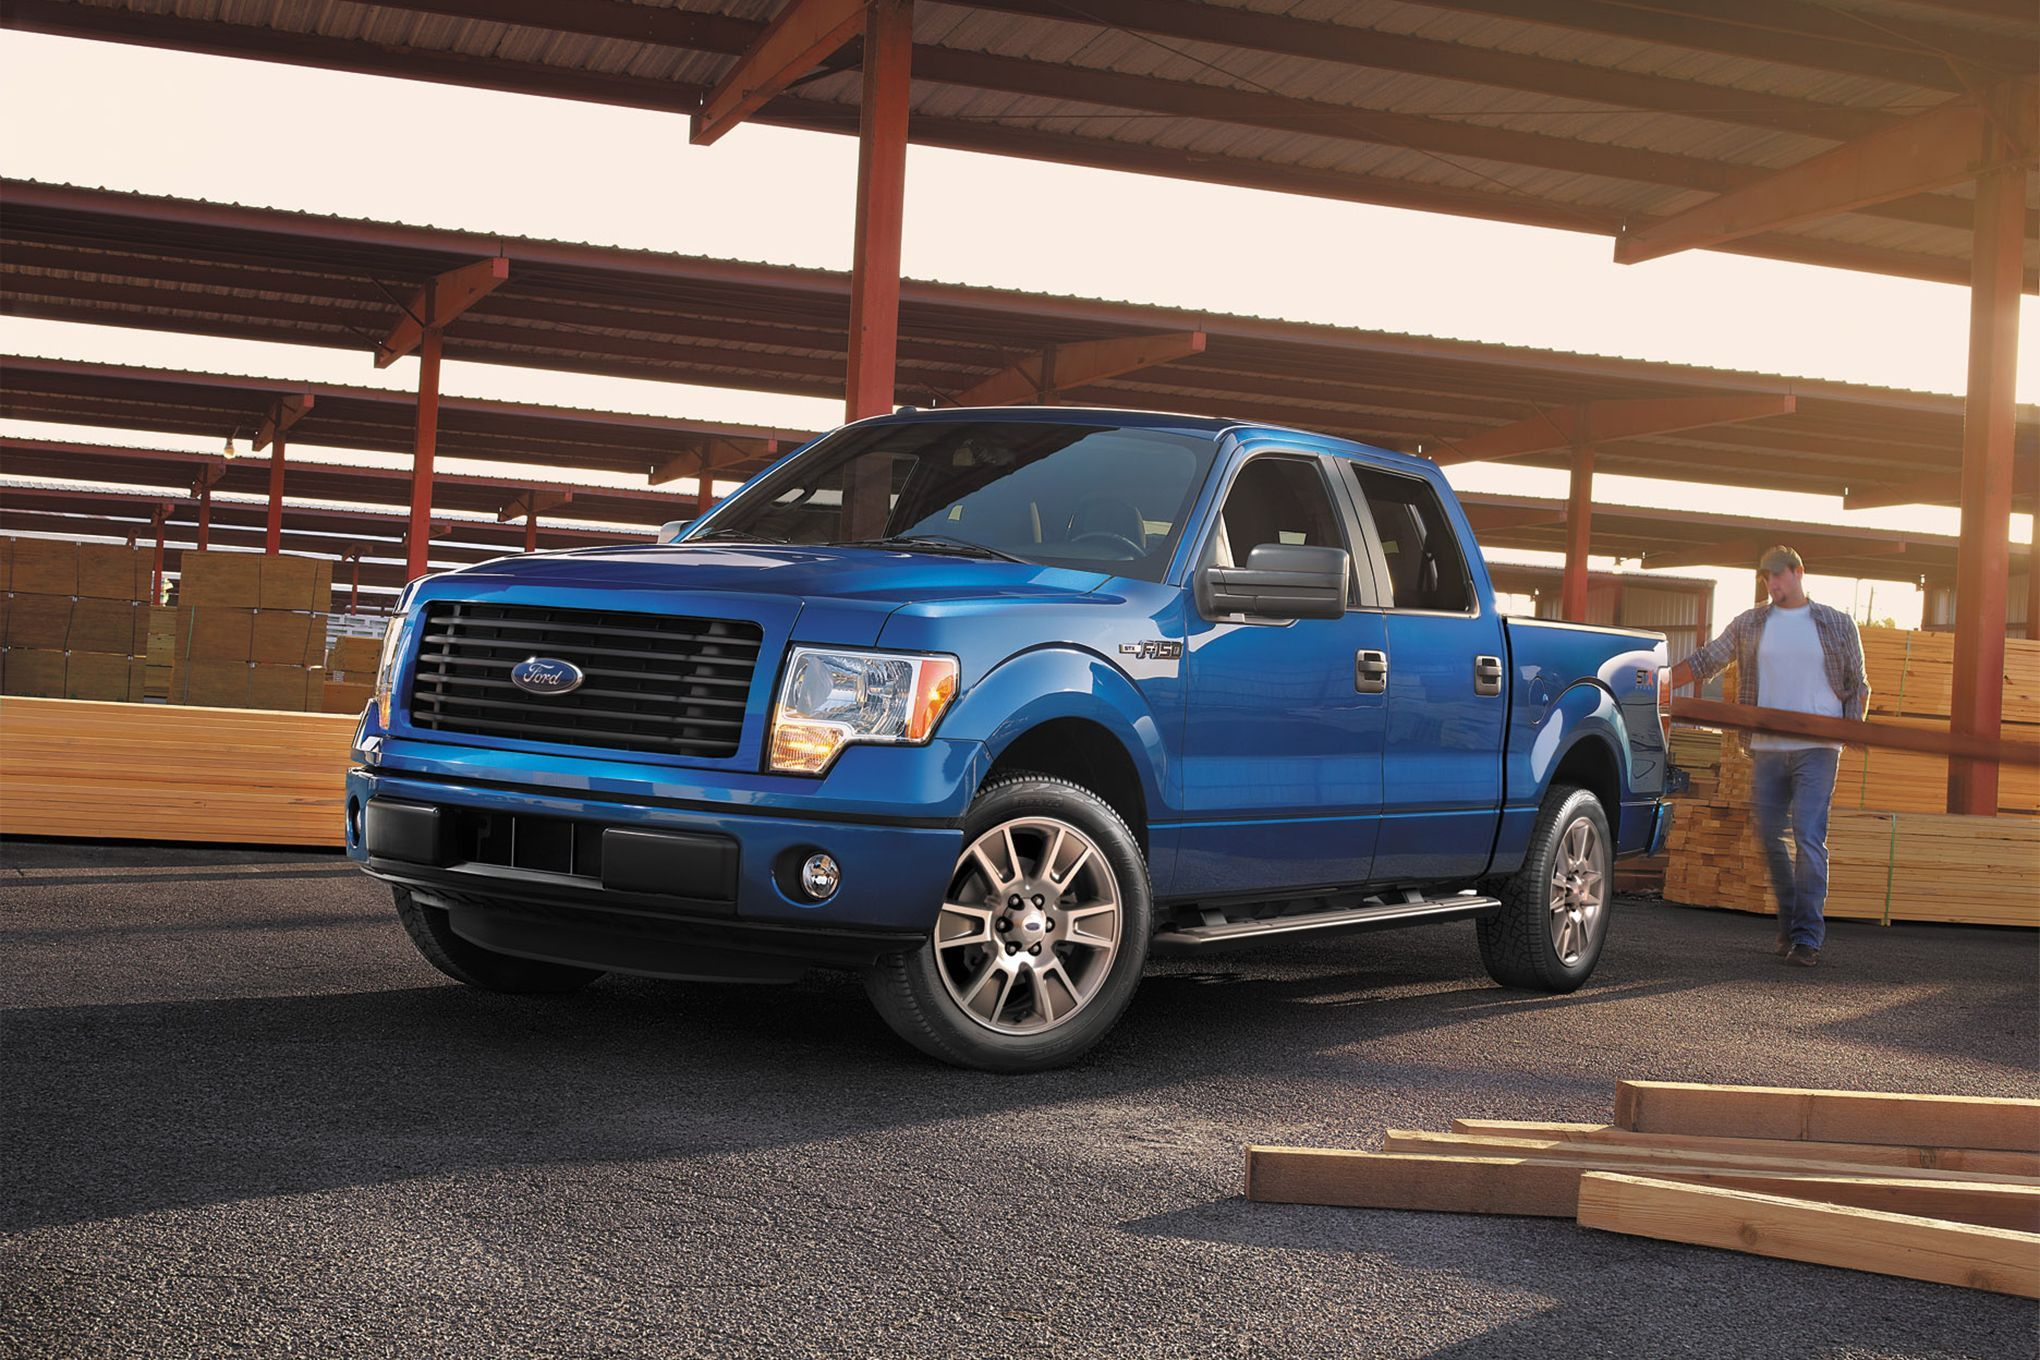 Truck Accessories Ford F150 Ford f150